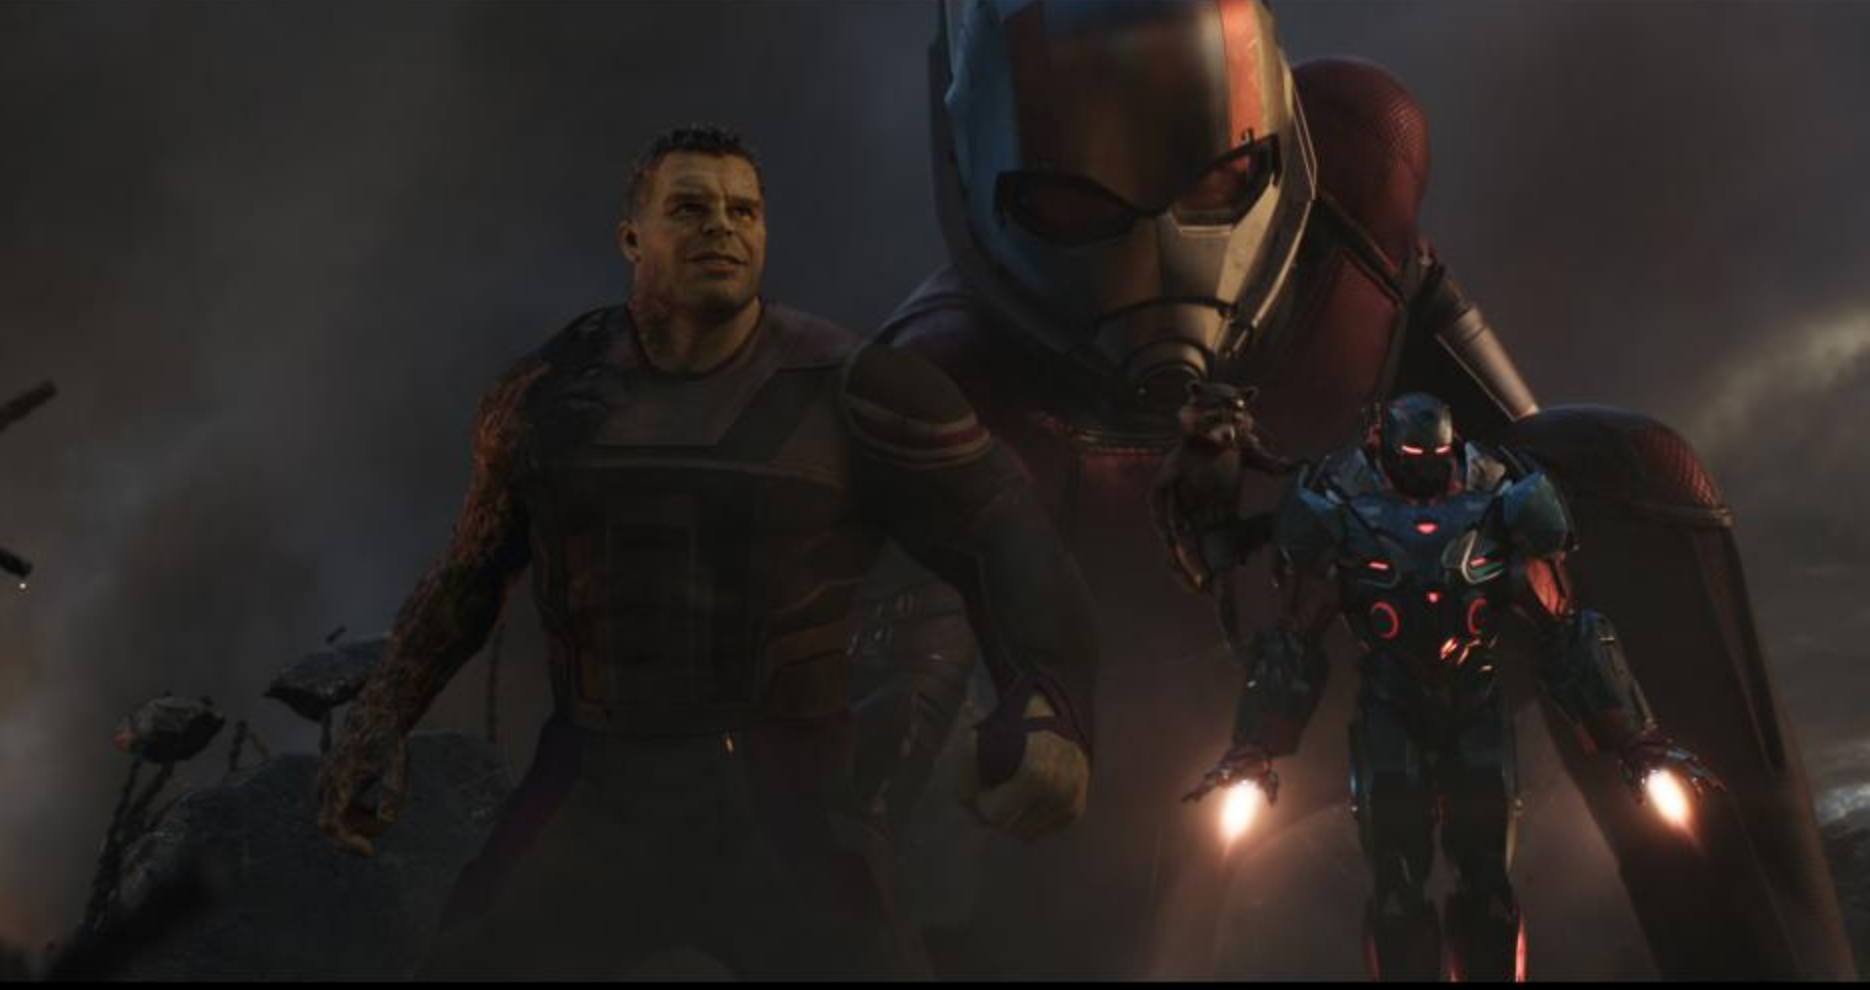 Avengers Endgame Hd Ending Images Highlight The Big Battle